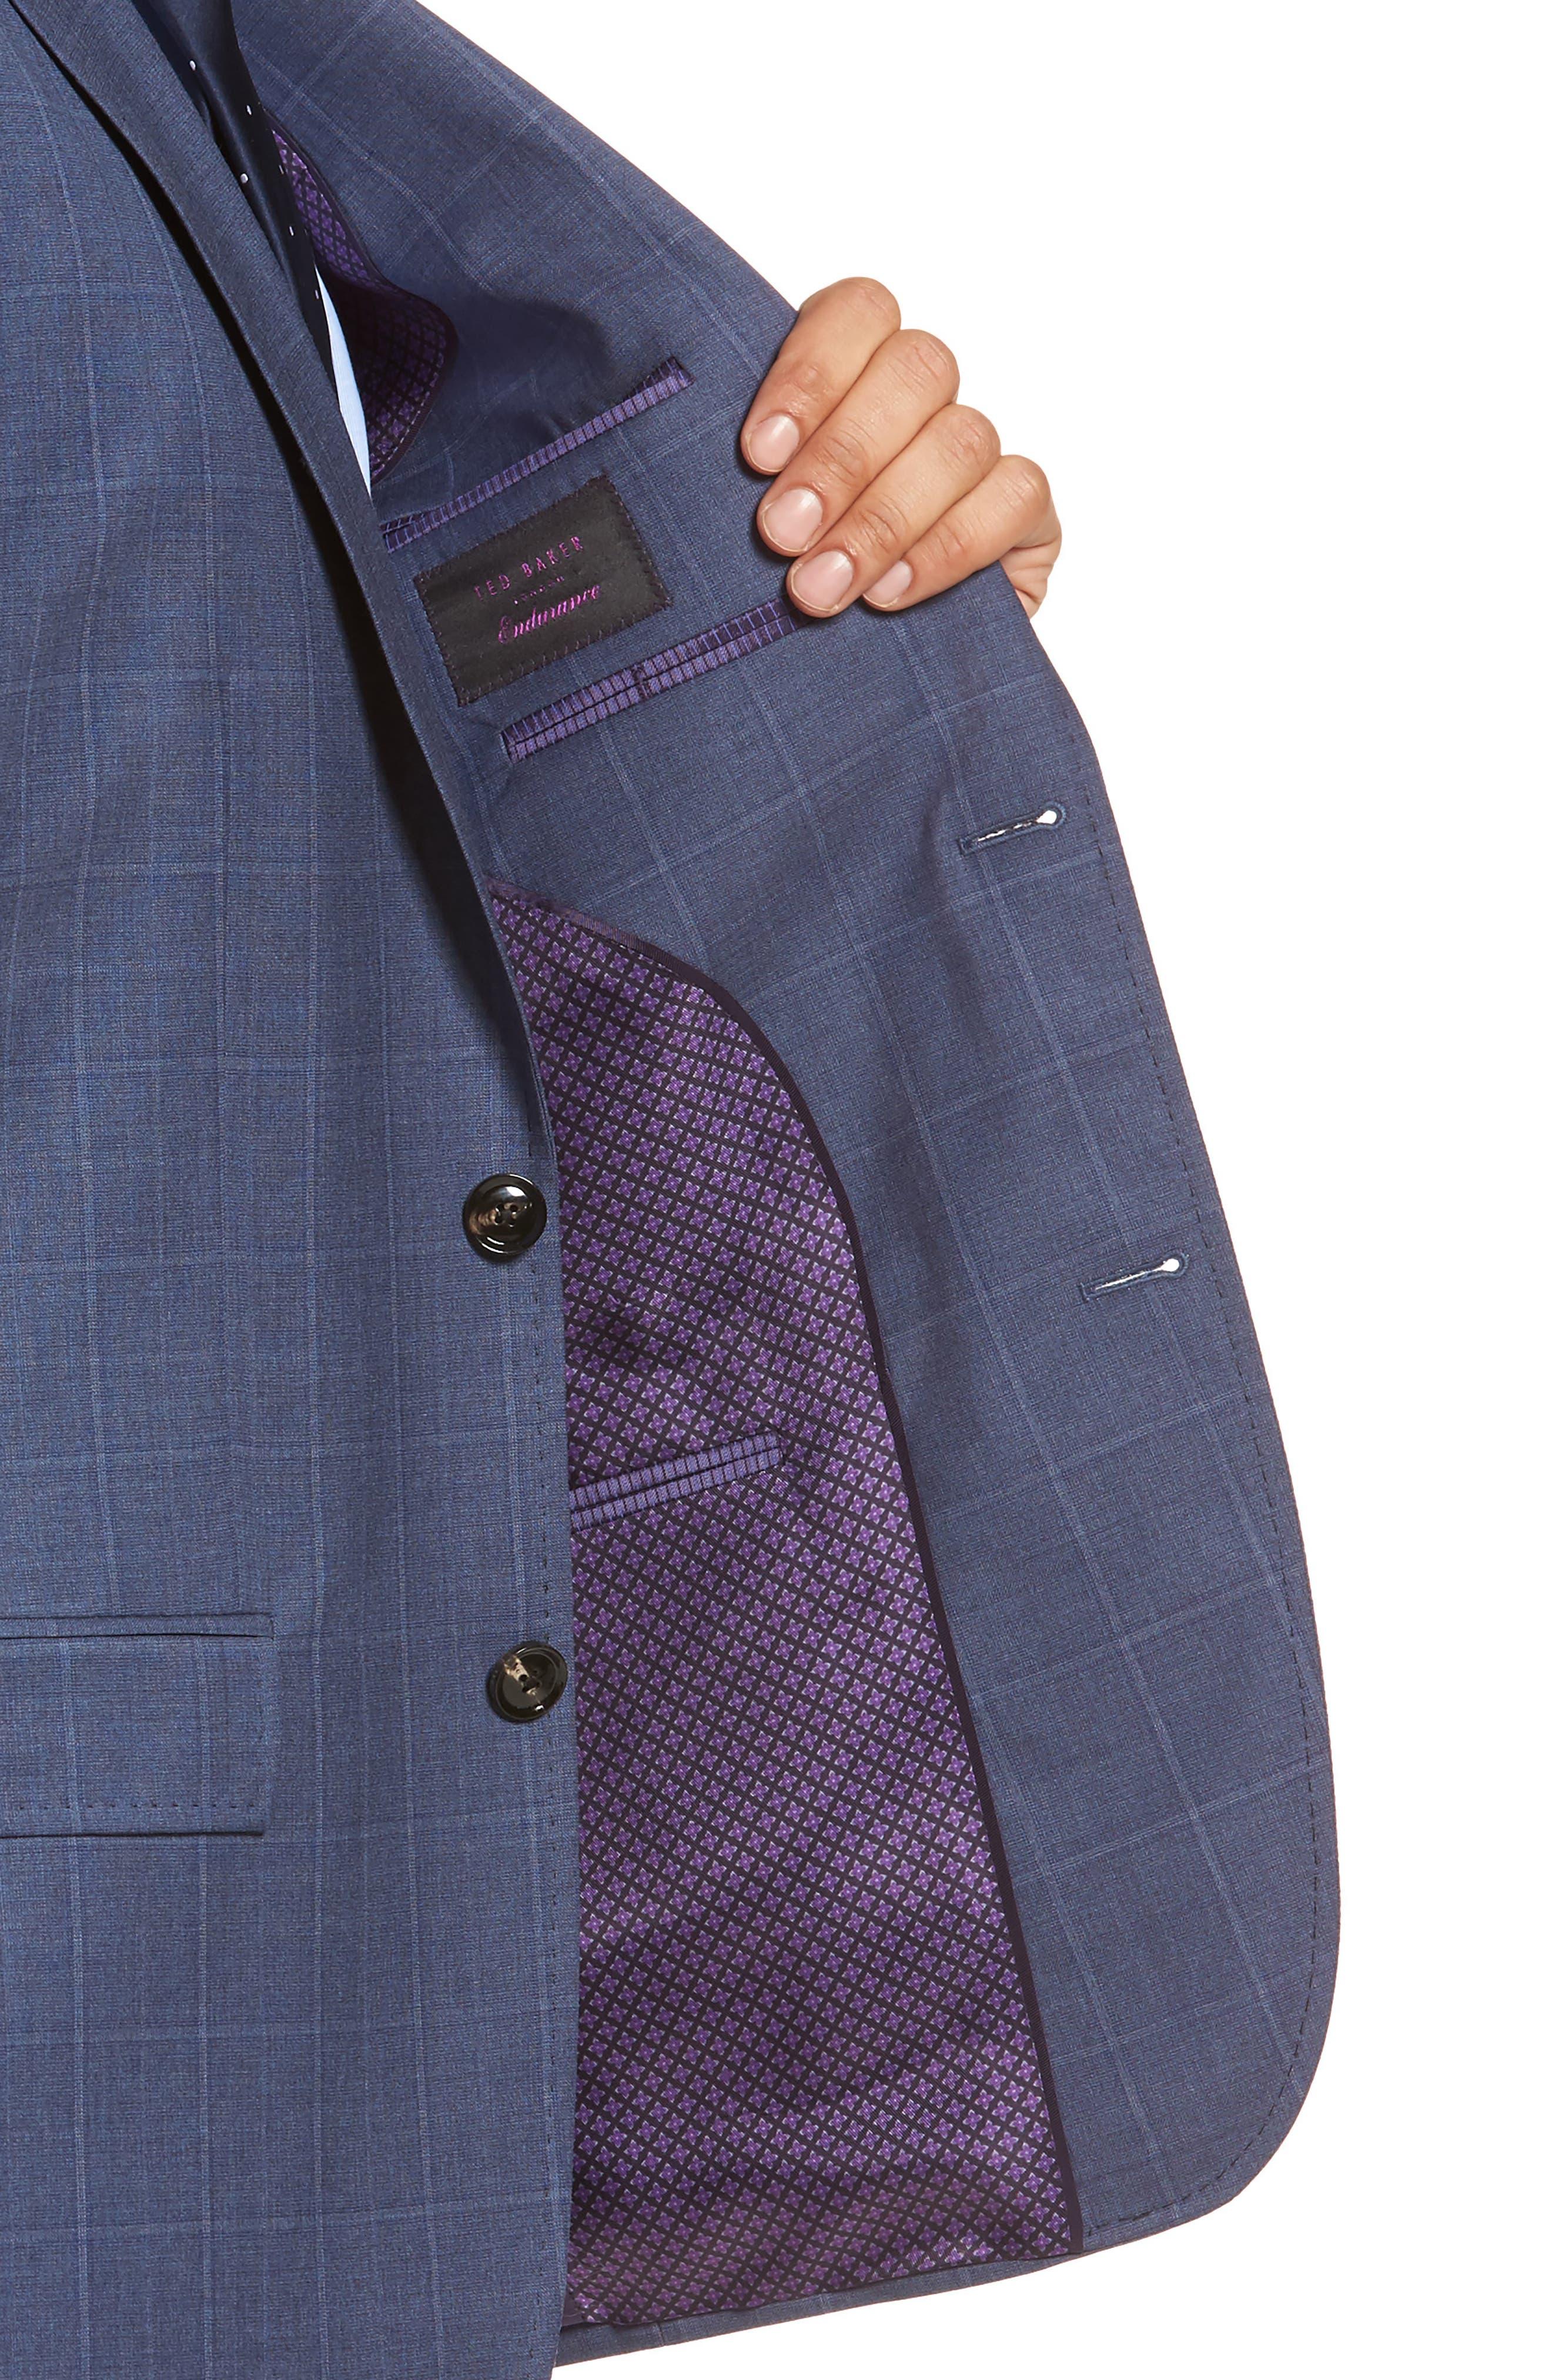 Jay Trim Fit Windowpane Wool Suit,                             Alternate thumbnail 4, color,                             Med Blue